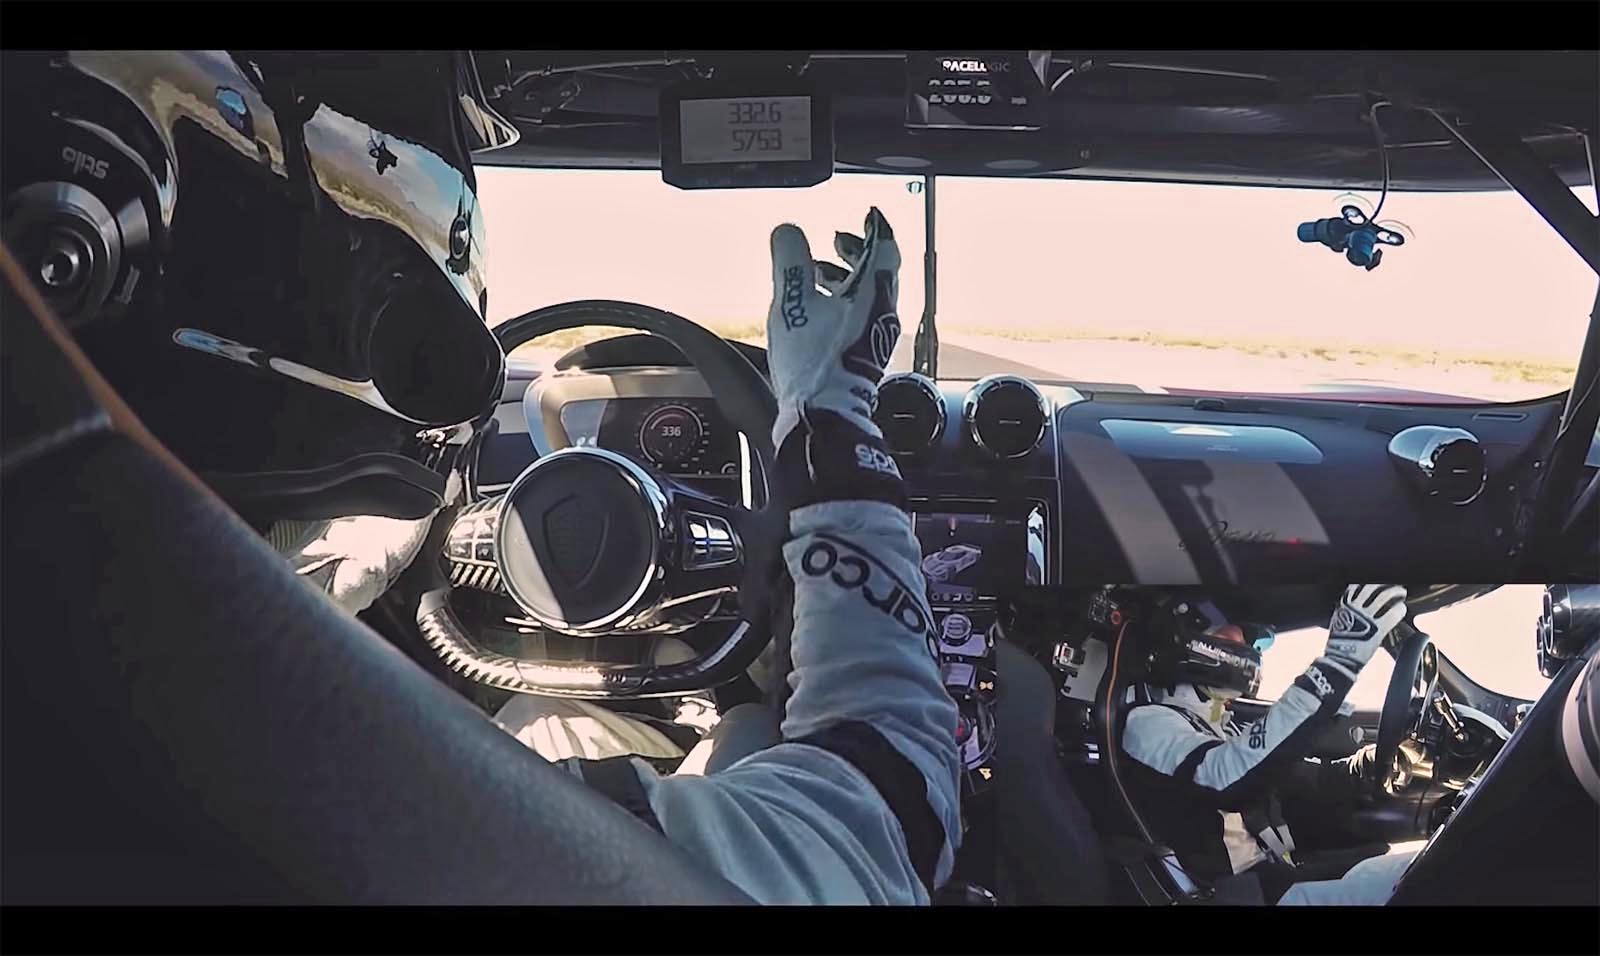 Photo of Δείτε το απίστευτο ρεκόρ ταχύτητας της Koenigsegg από την θέση του οδηγού [vid]